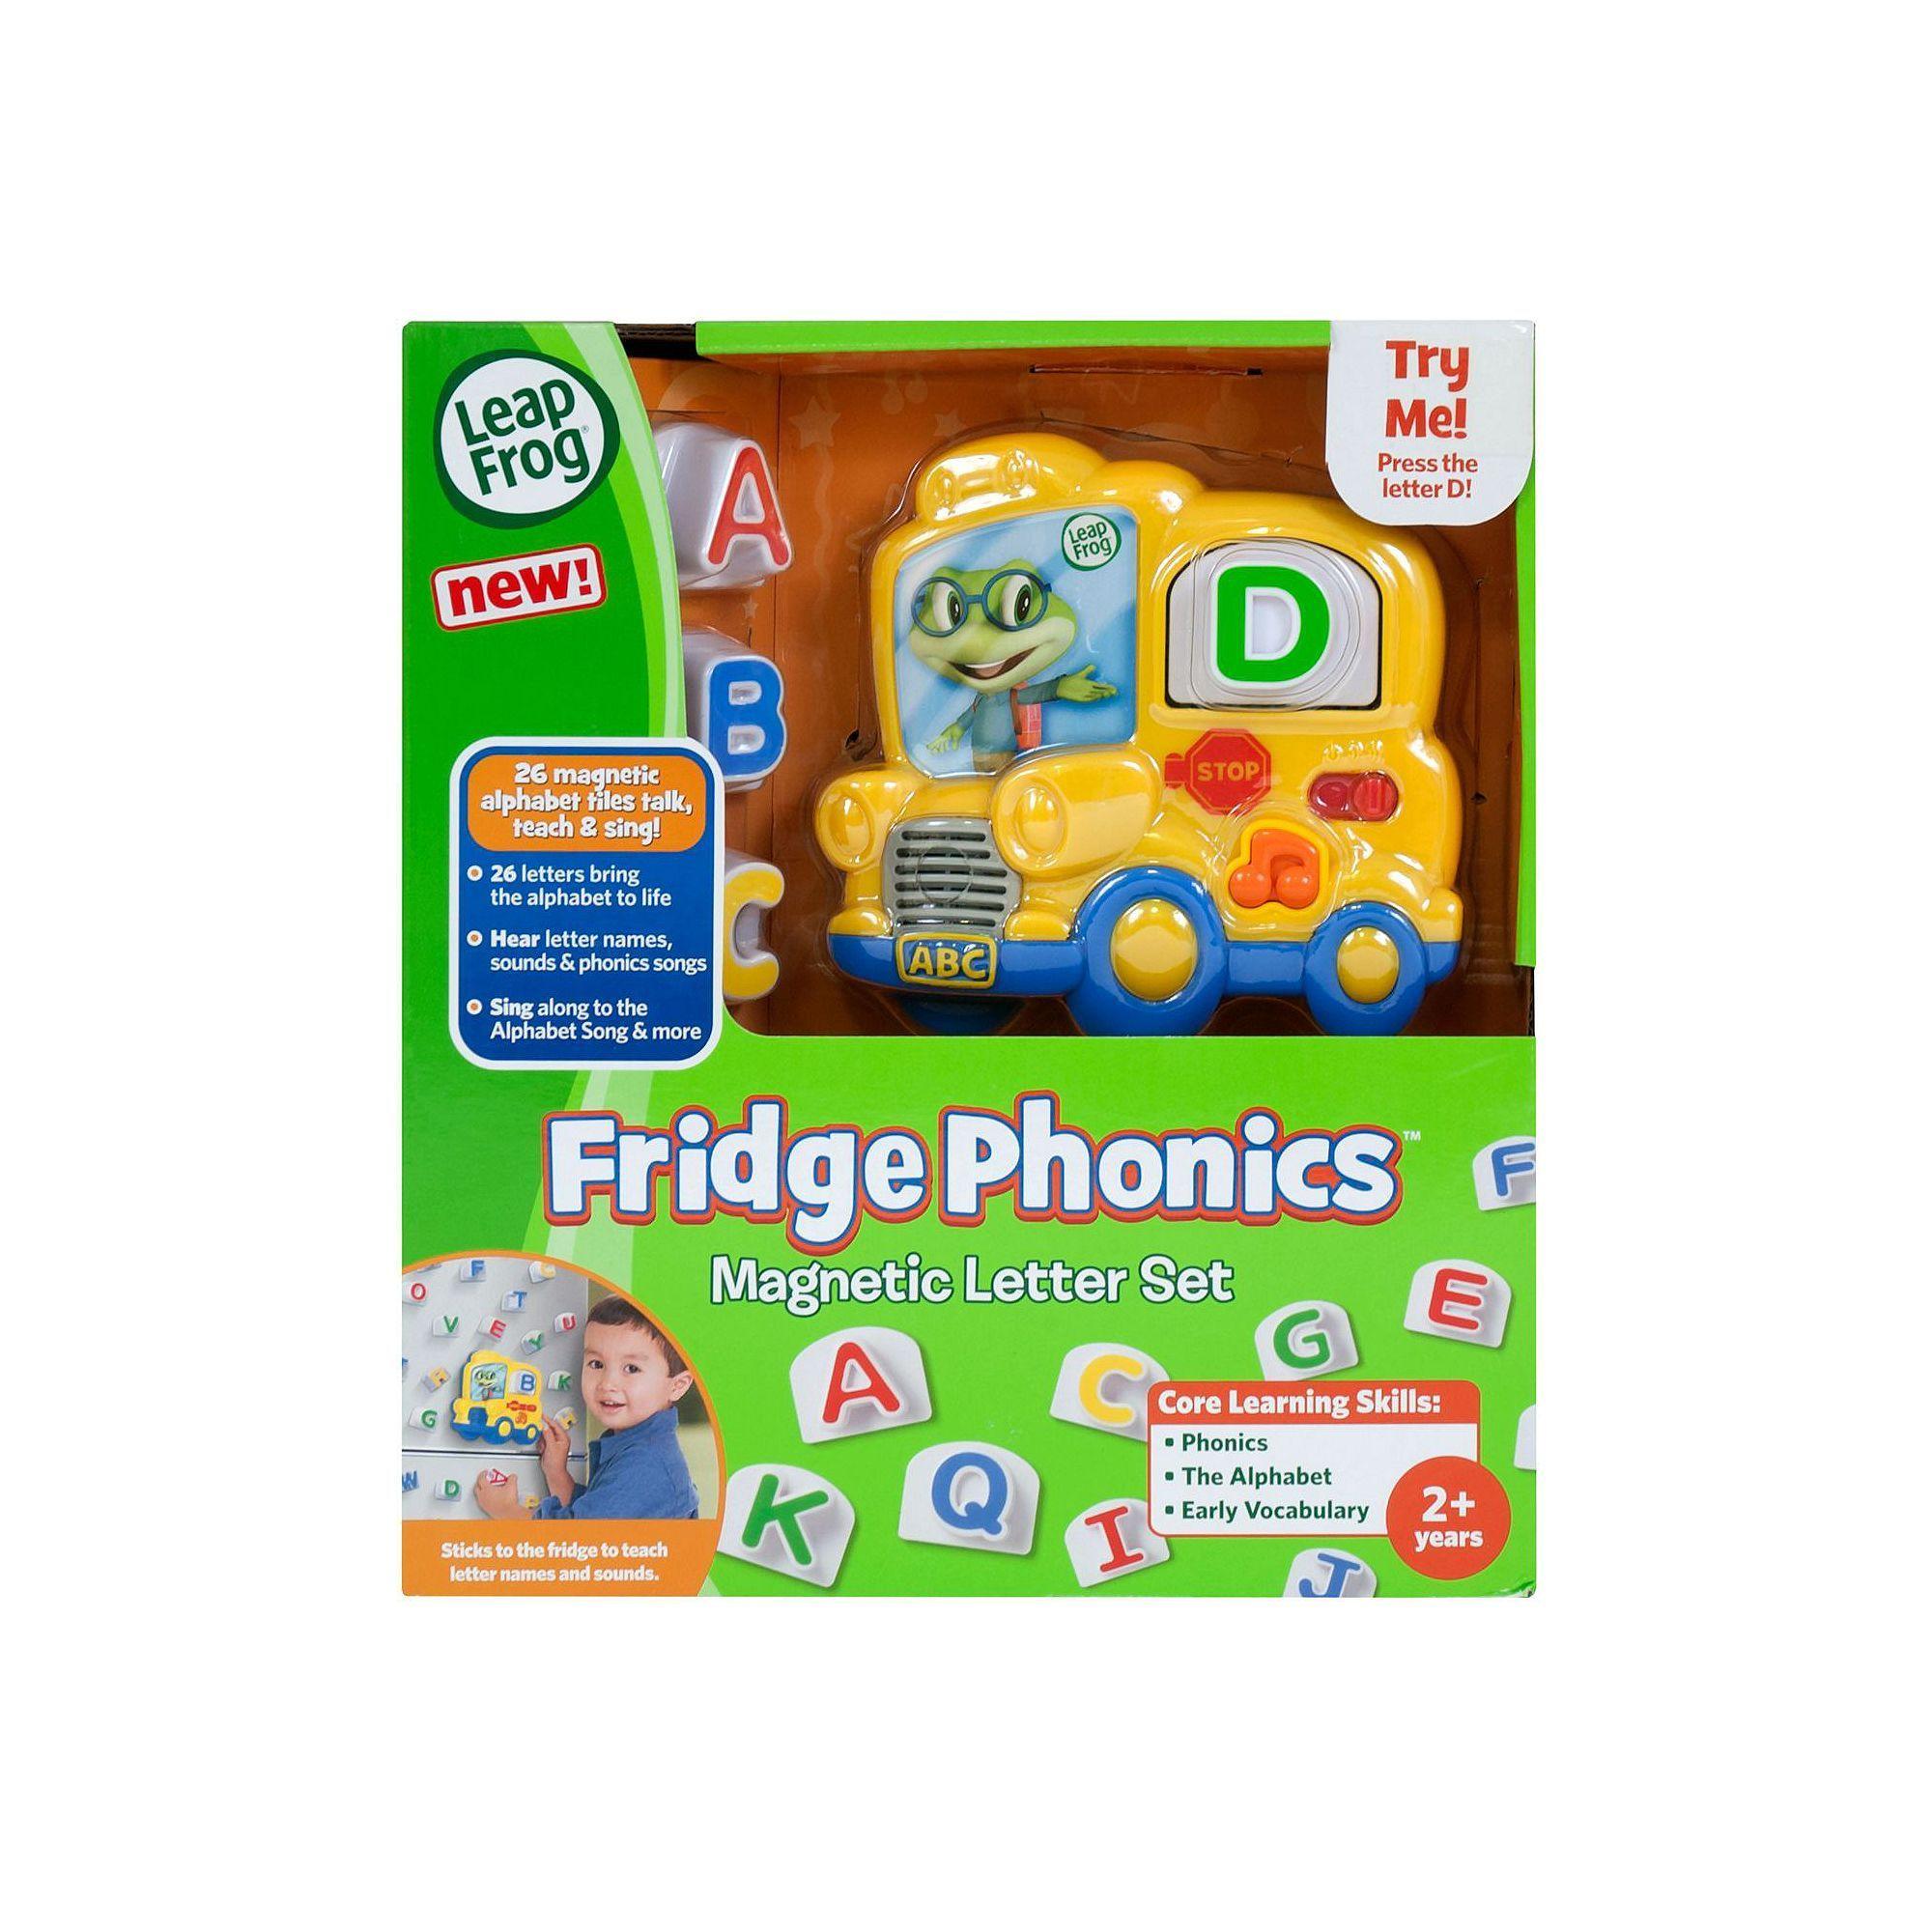 Leapfrog Fridge Phonics Magnetic Letter Set Products Pinterest